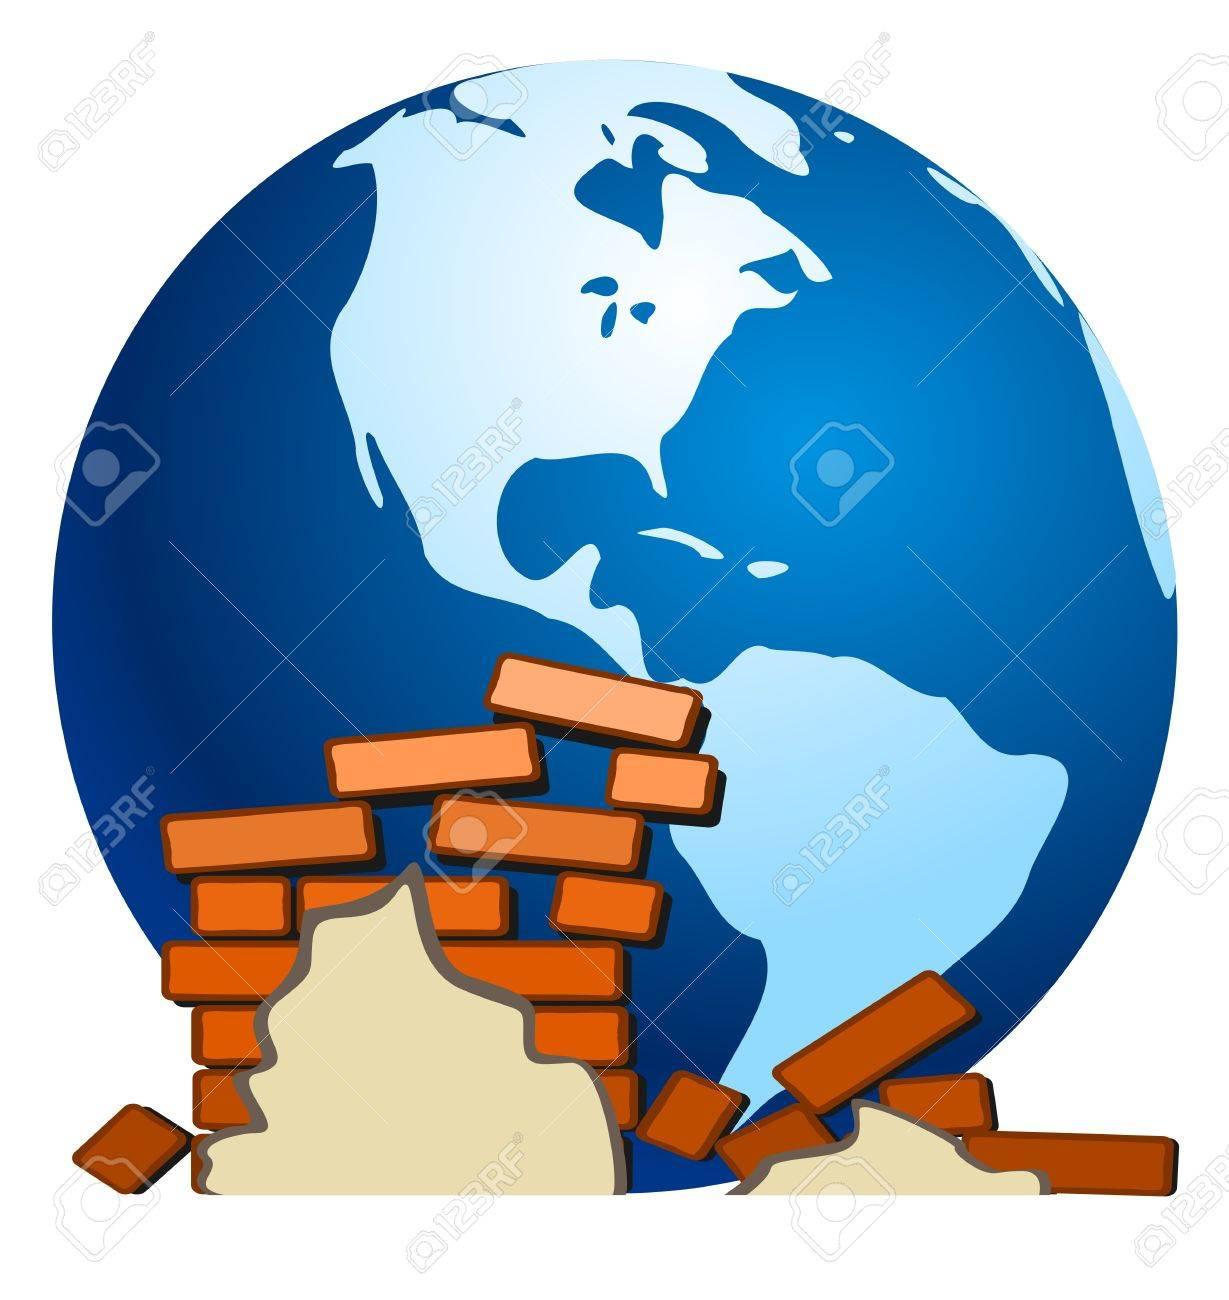 Earth and earth quake Stock Vector - 10659693